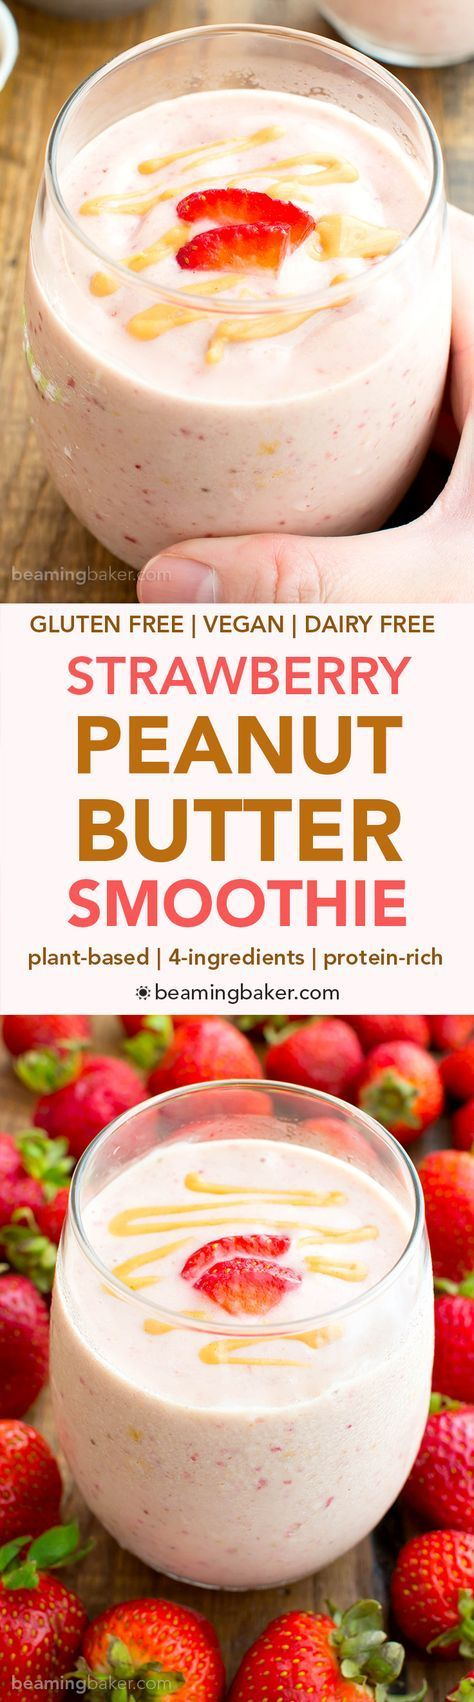 Vegan Strawberry Peanut Butter Smoothie (V+GF): an easy 4 ingredient recipe for protein-rich, creamy smoothies bursting with strawberry and PB flavor. #Vegan #GlutenFree #DairyFree